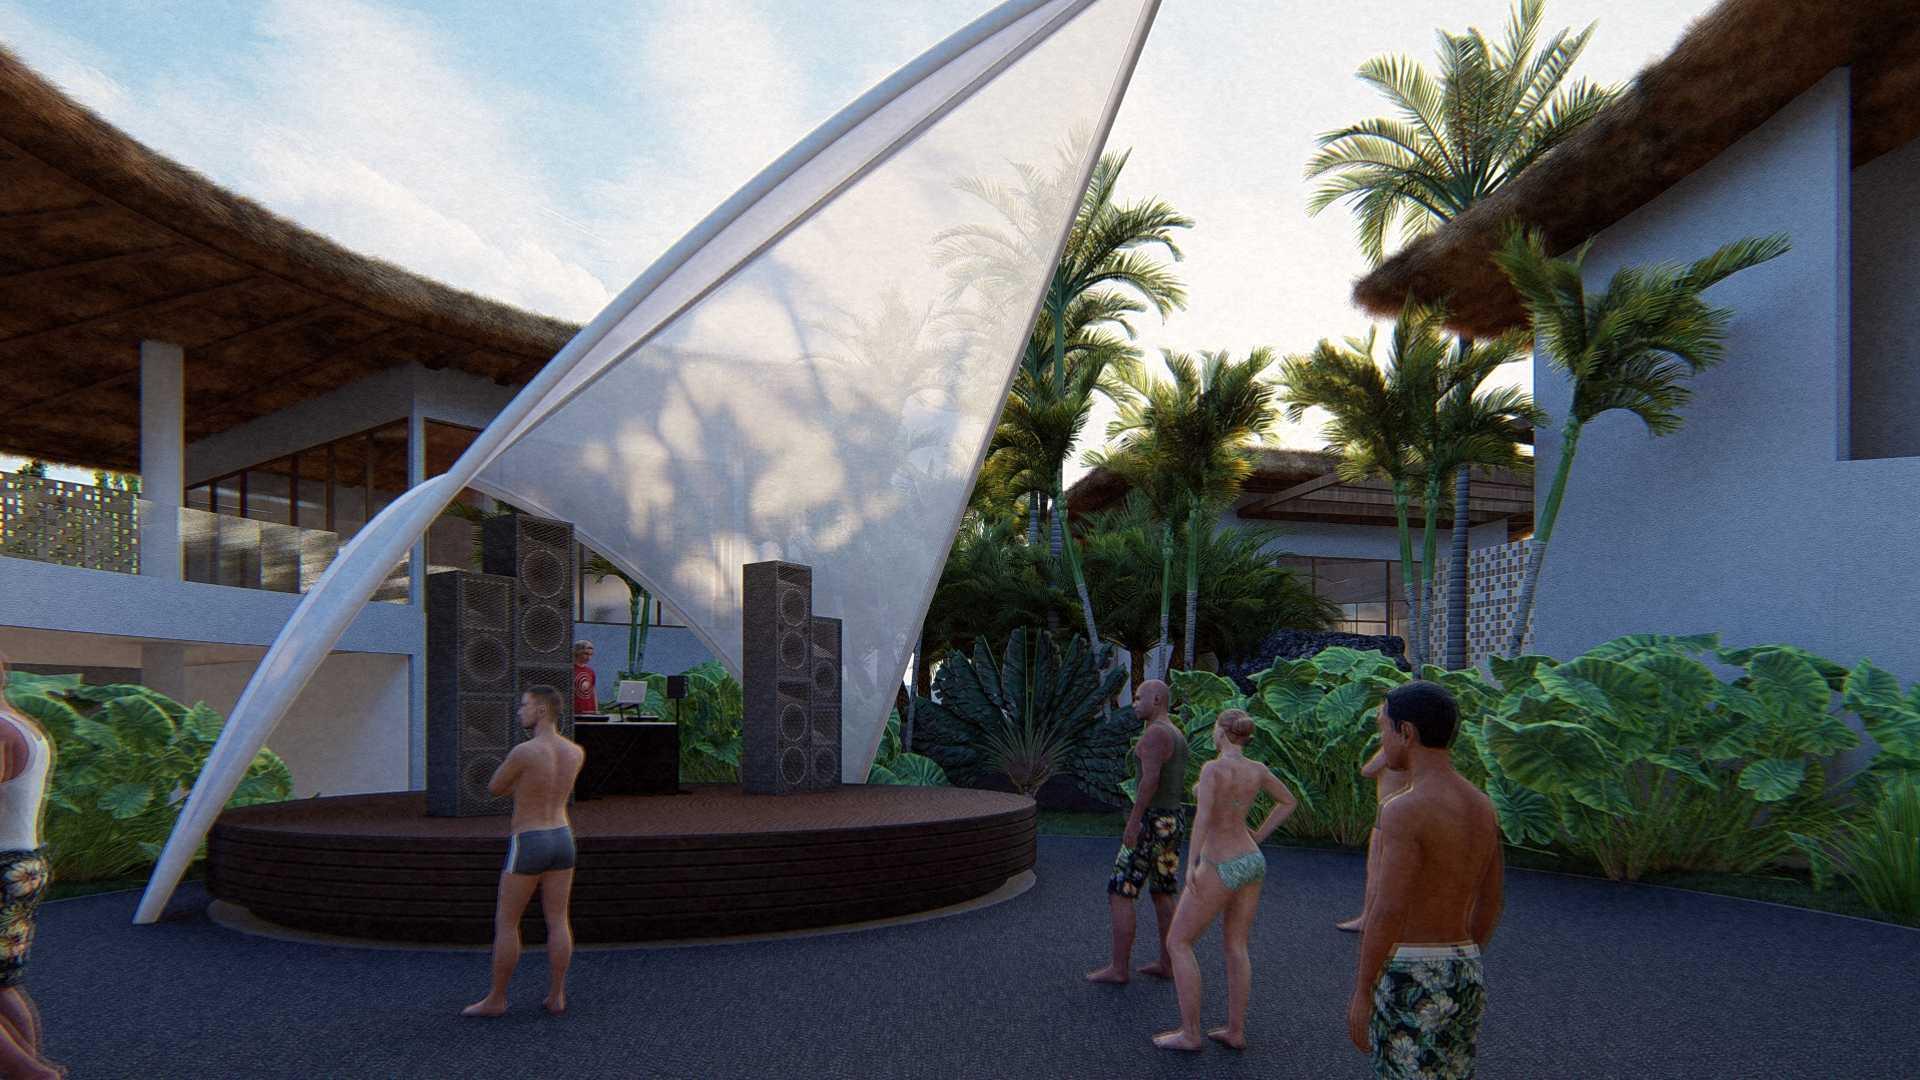 Raaj Gill Arsitek Goethe Club Canggu, Kec. Kuta Utara, Kabupaten Badung, Bali, Indonesia Bali, Indonesia Raaj-Gill-Arsitek-Studio-Bali  102250